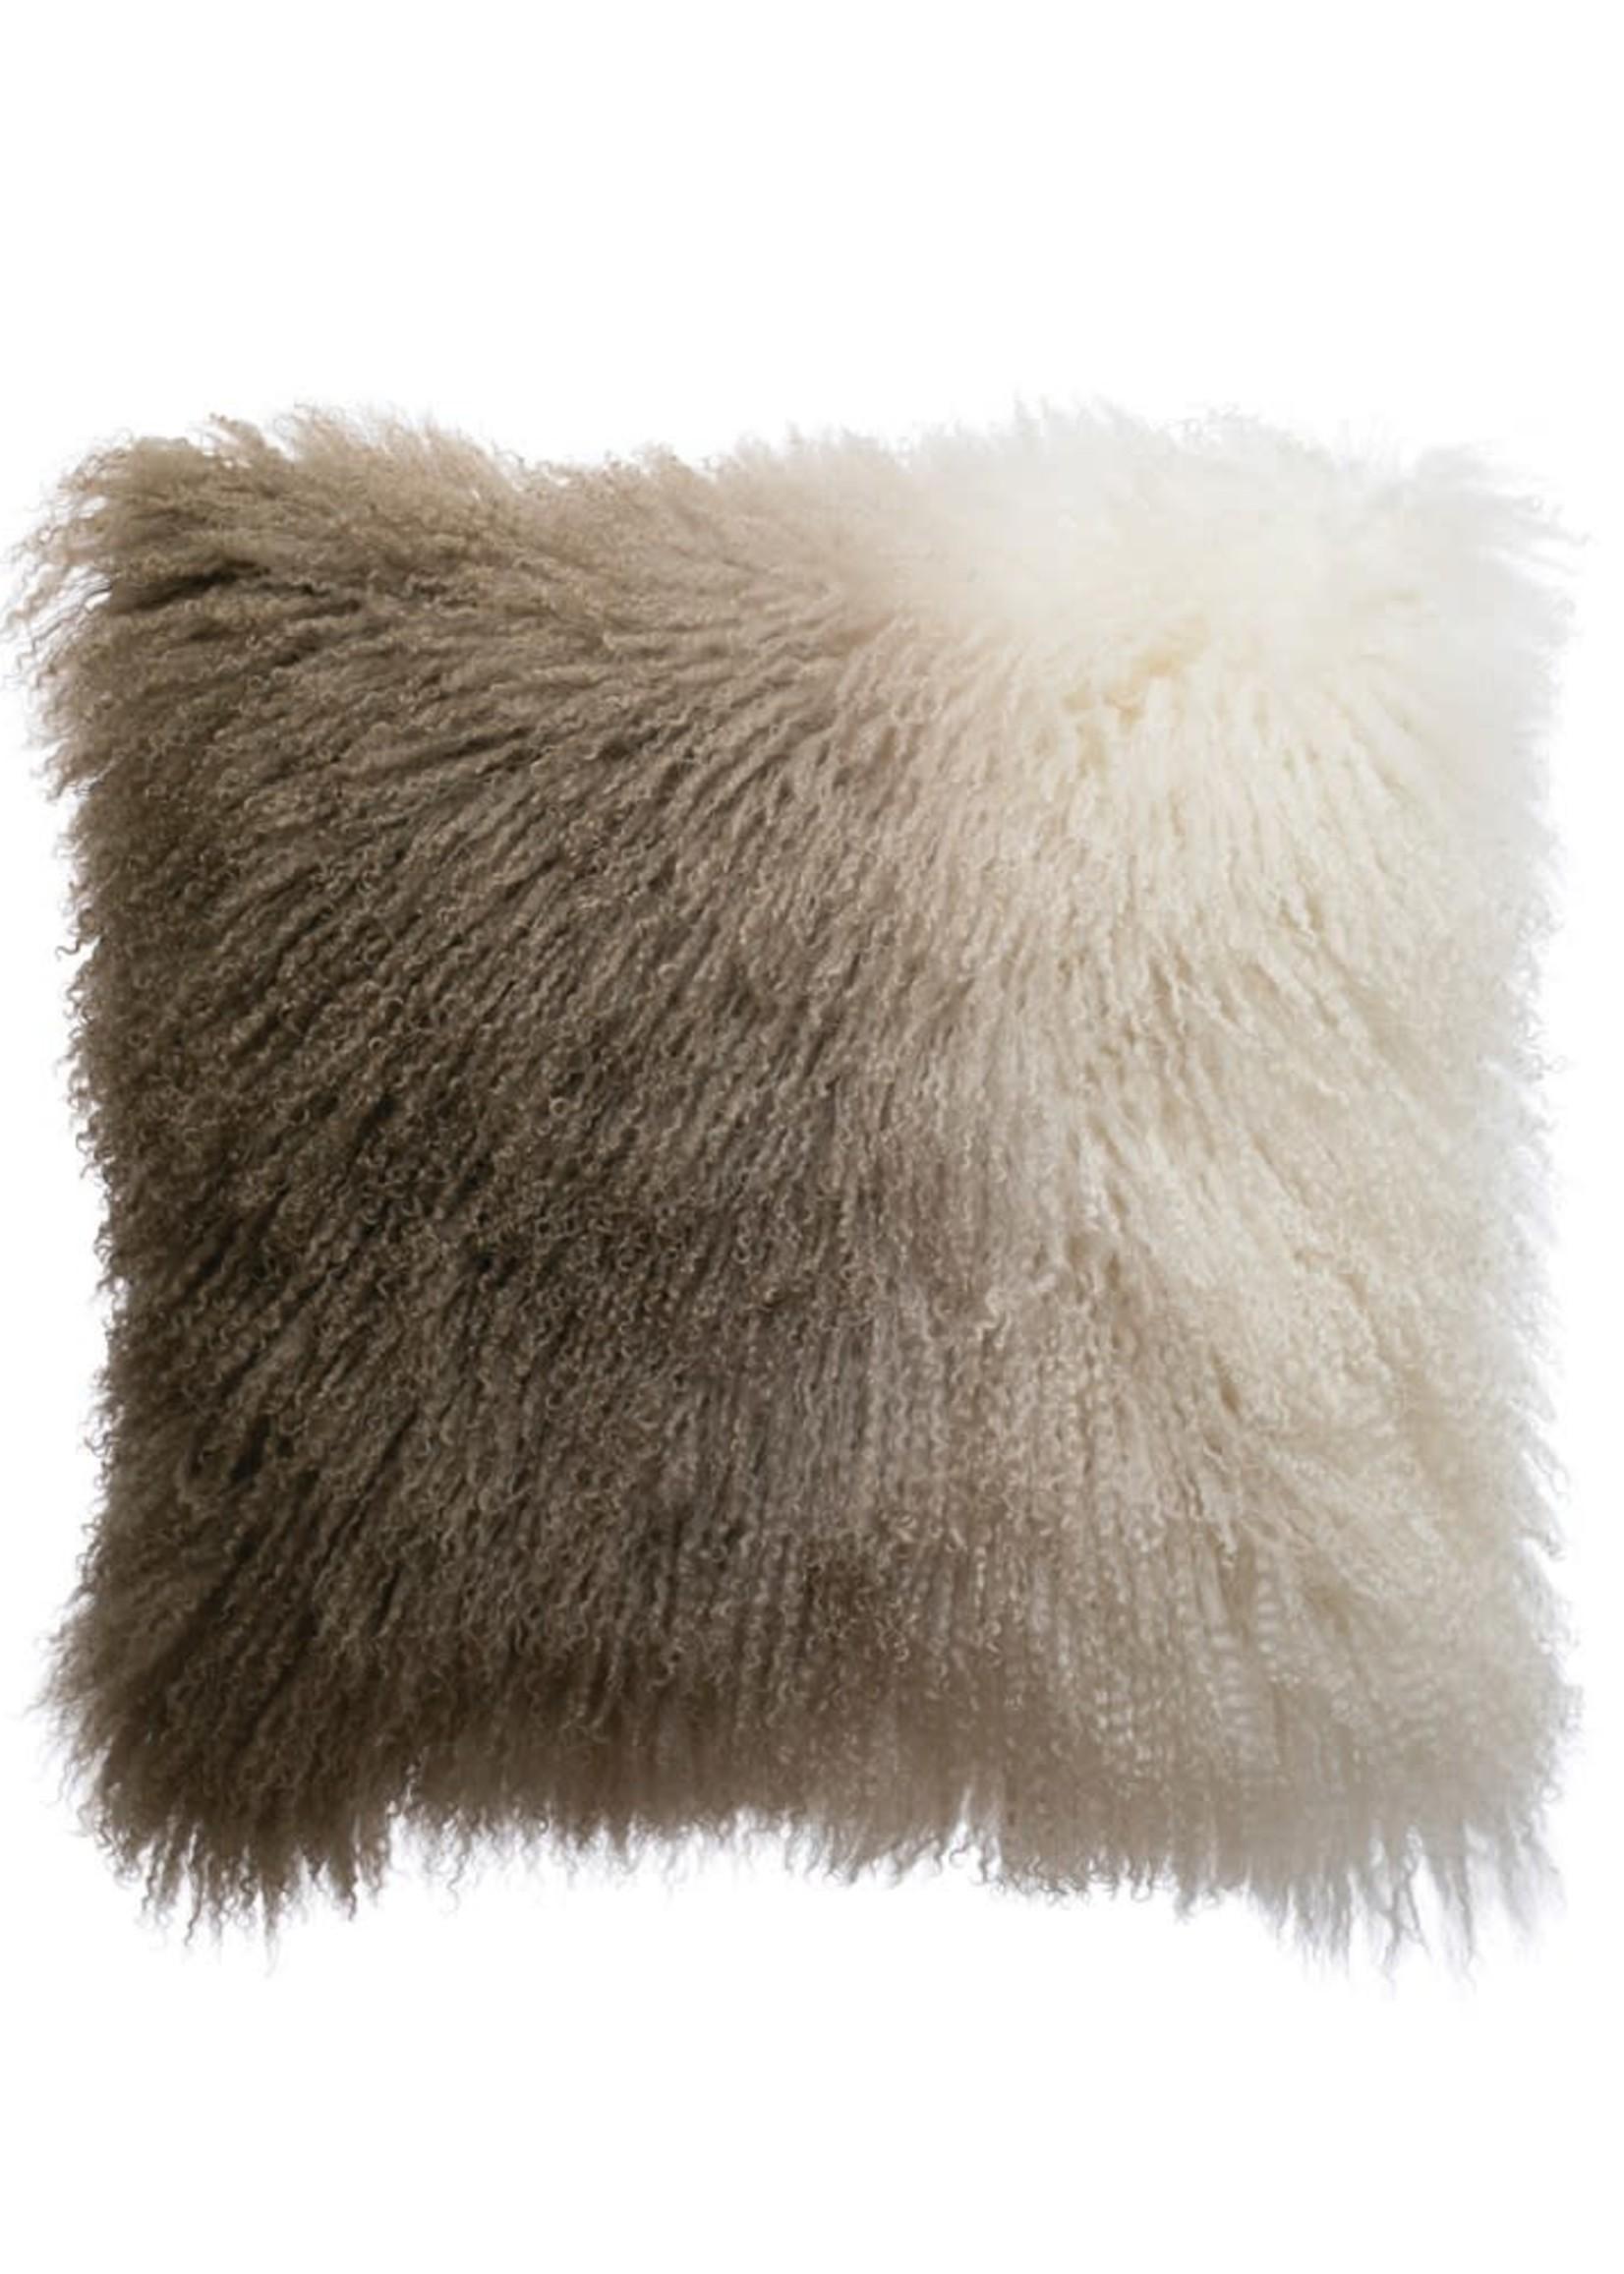 Square Mongolian Lamb Fur Dip Dyed Pillow, Natural & Charcoal Color